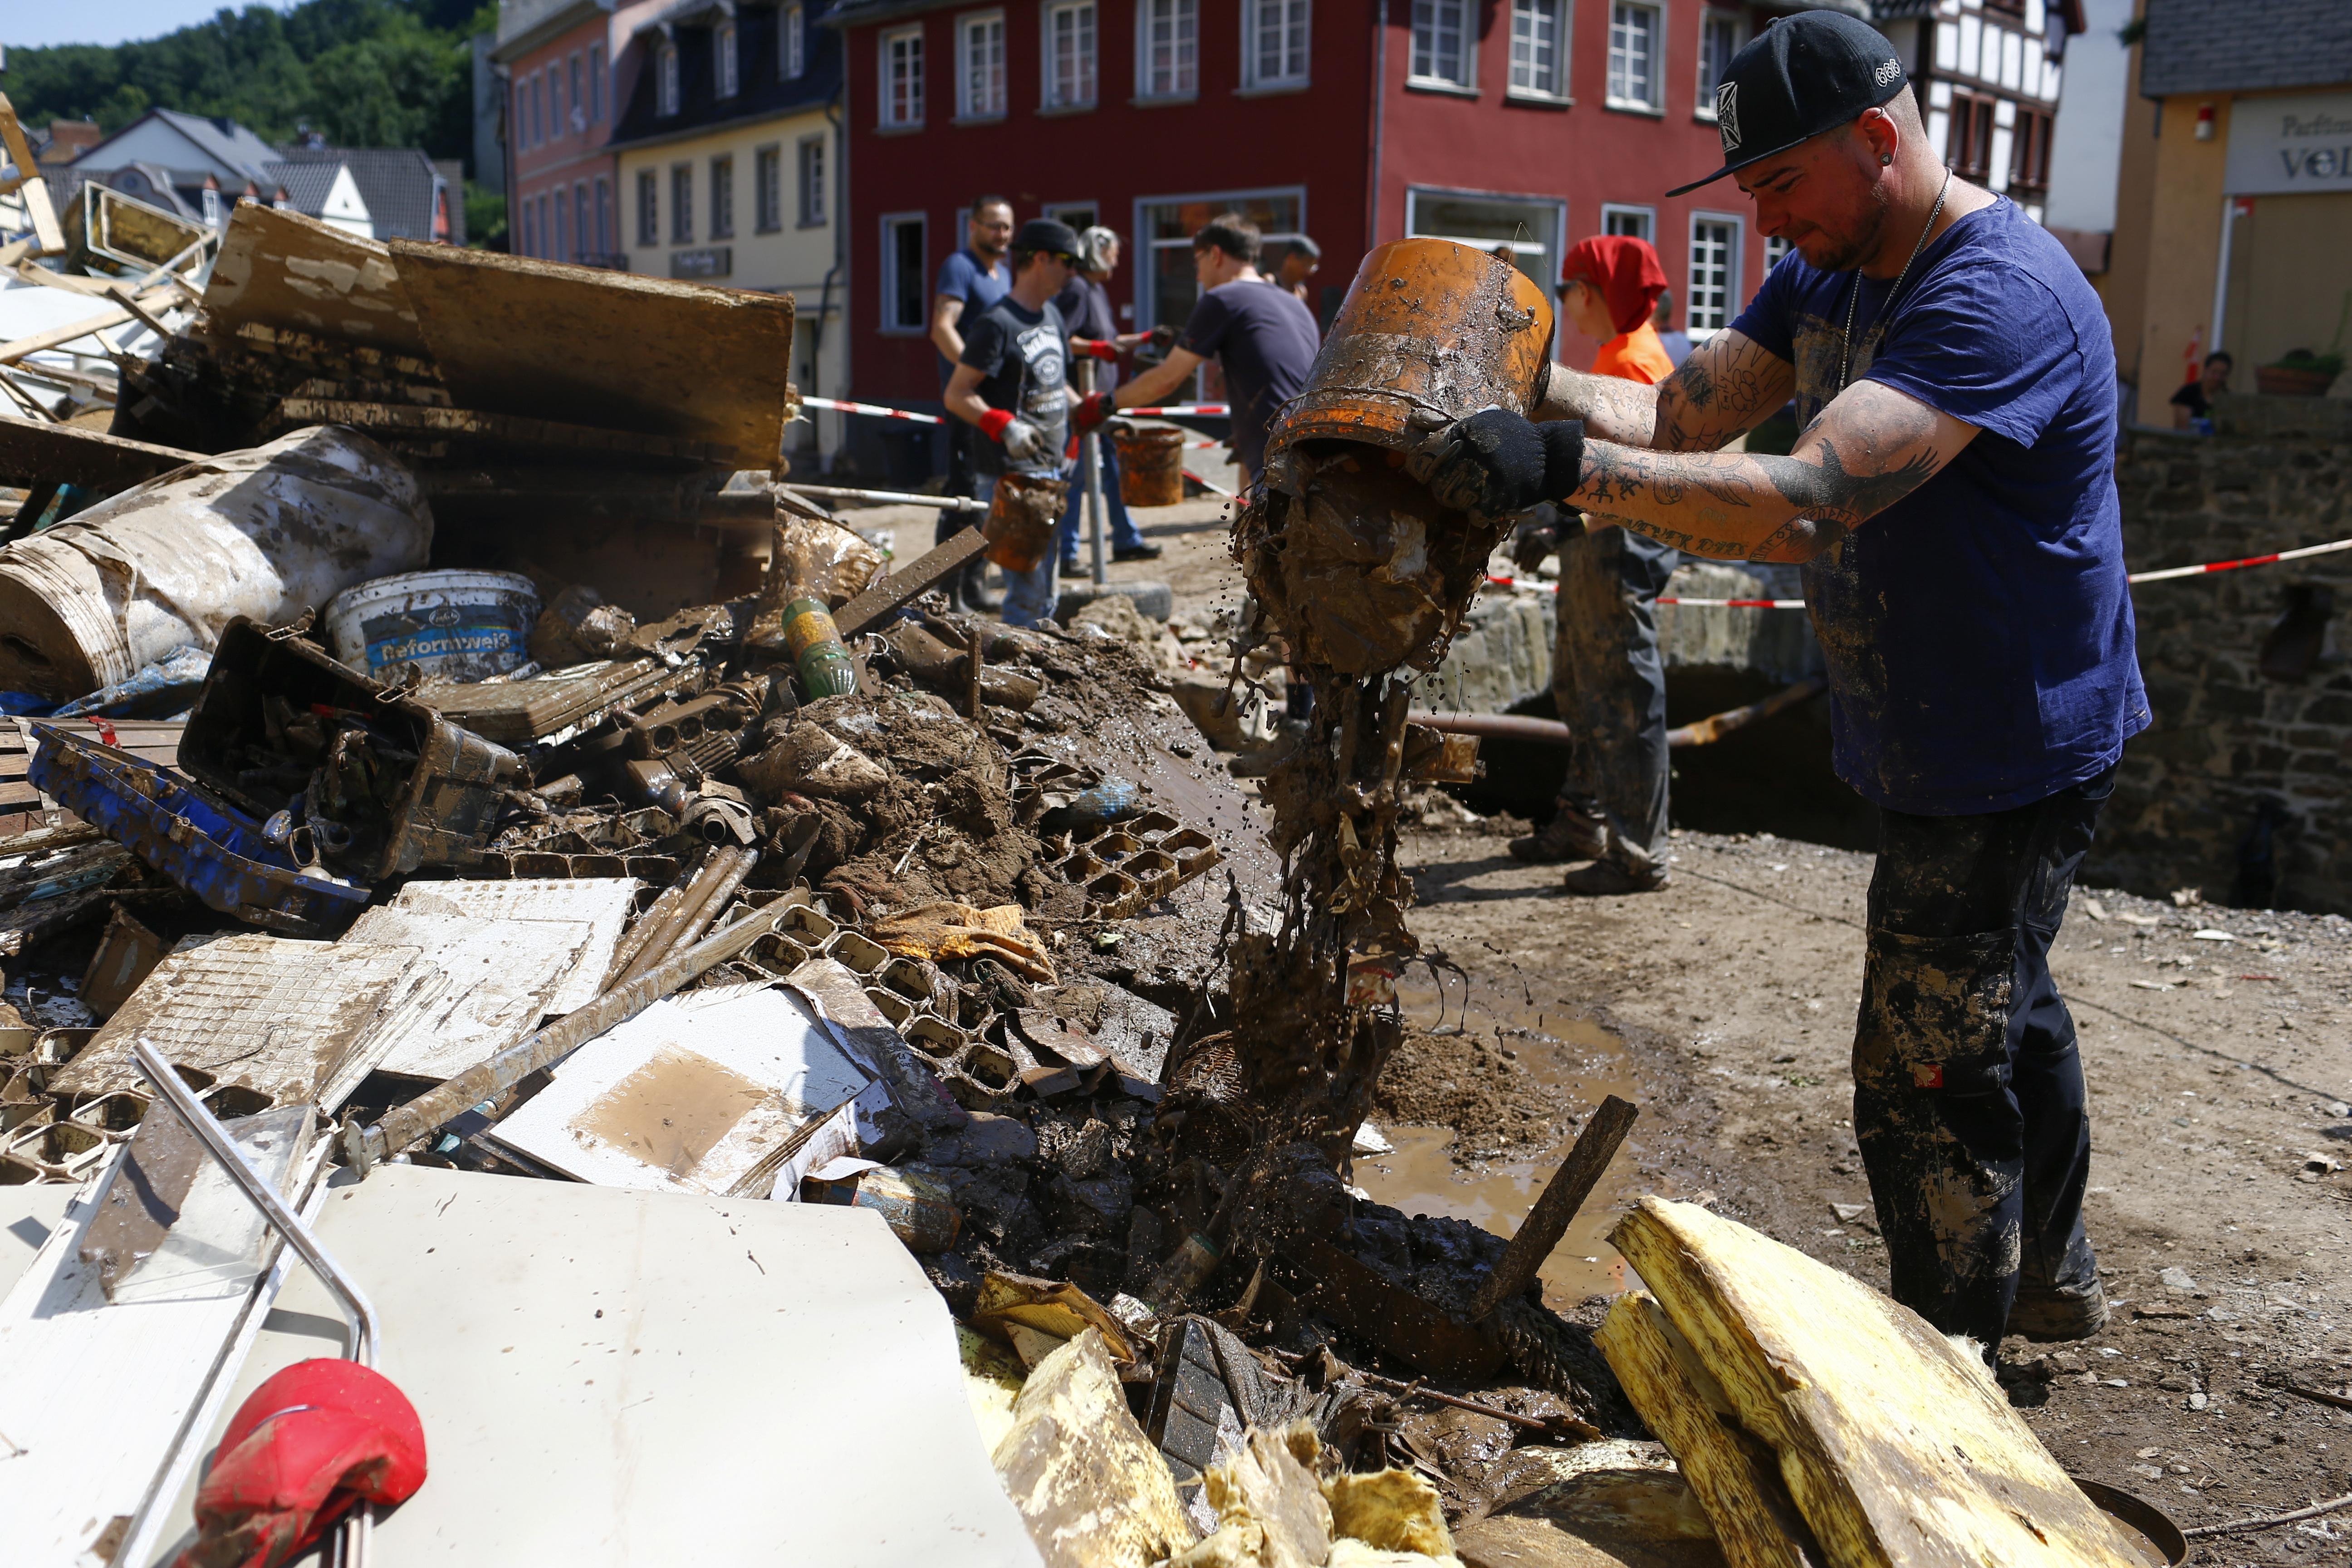 People help to clean up following heavy rainfalls, in Bad Muenstereifel, North Rhine-Westphalia state, Germany, July 21, 2021. REUTERS/Thilo Schmuelgen/File Photo